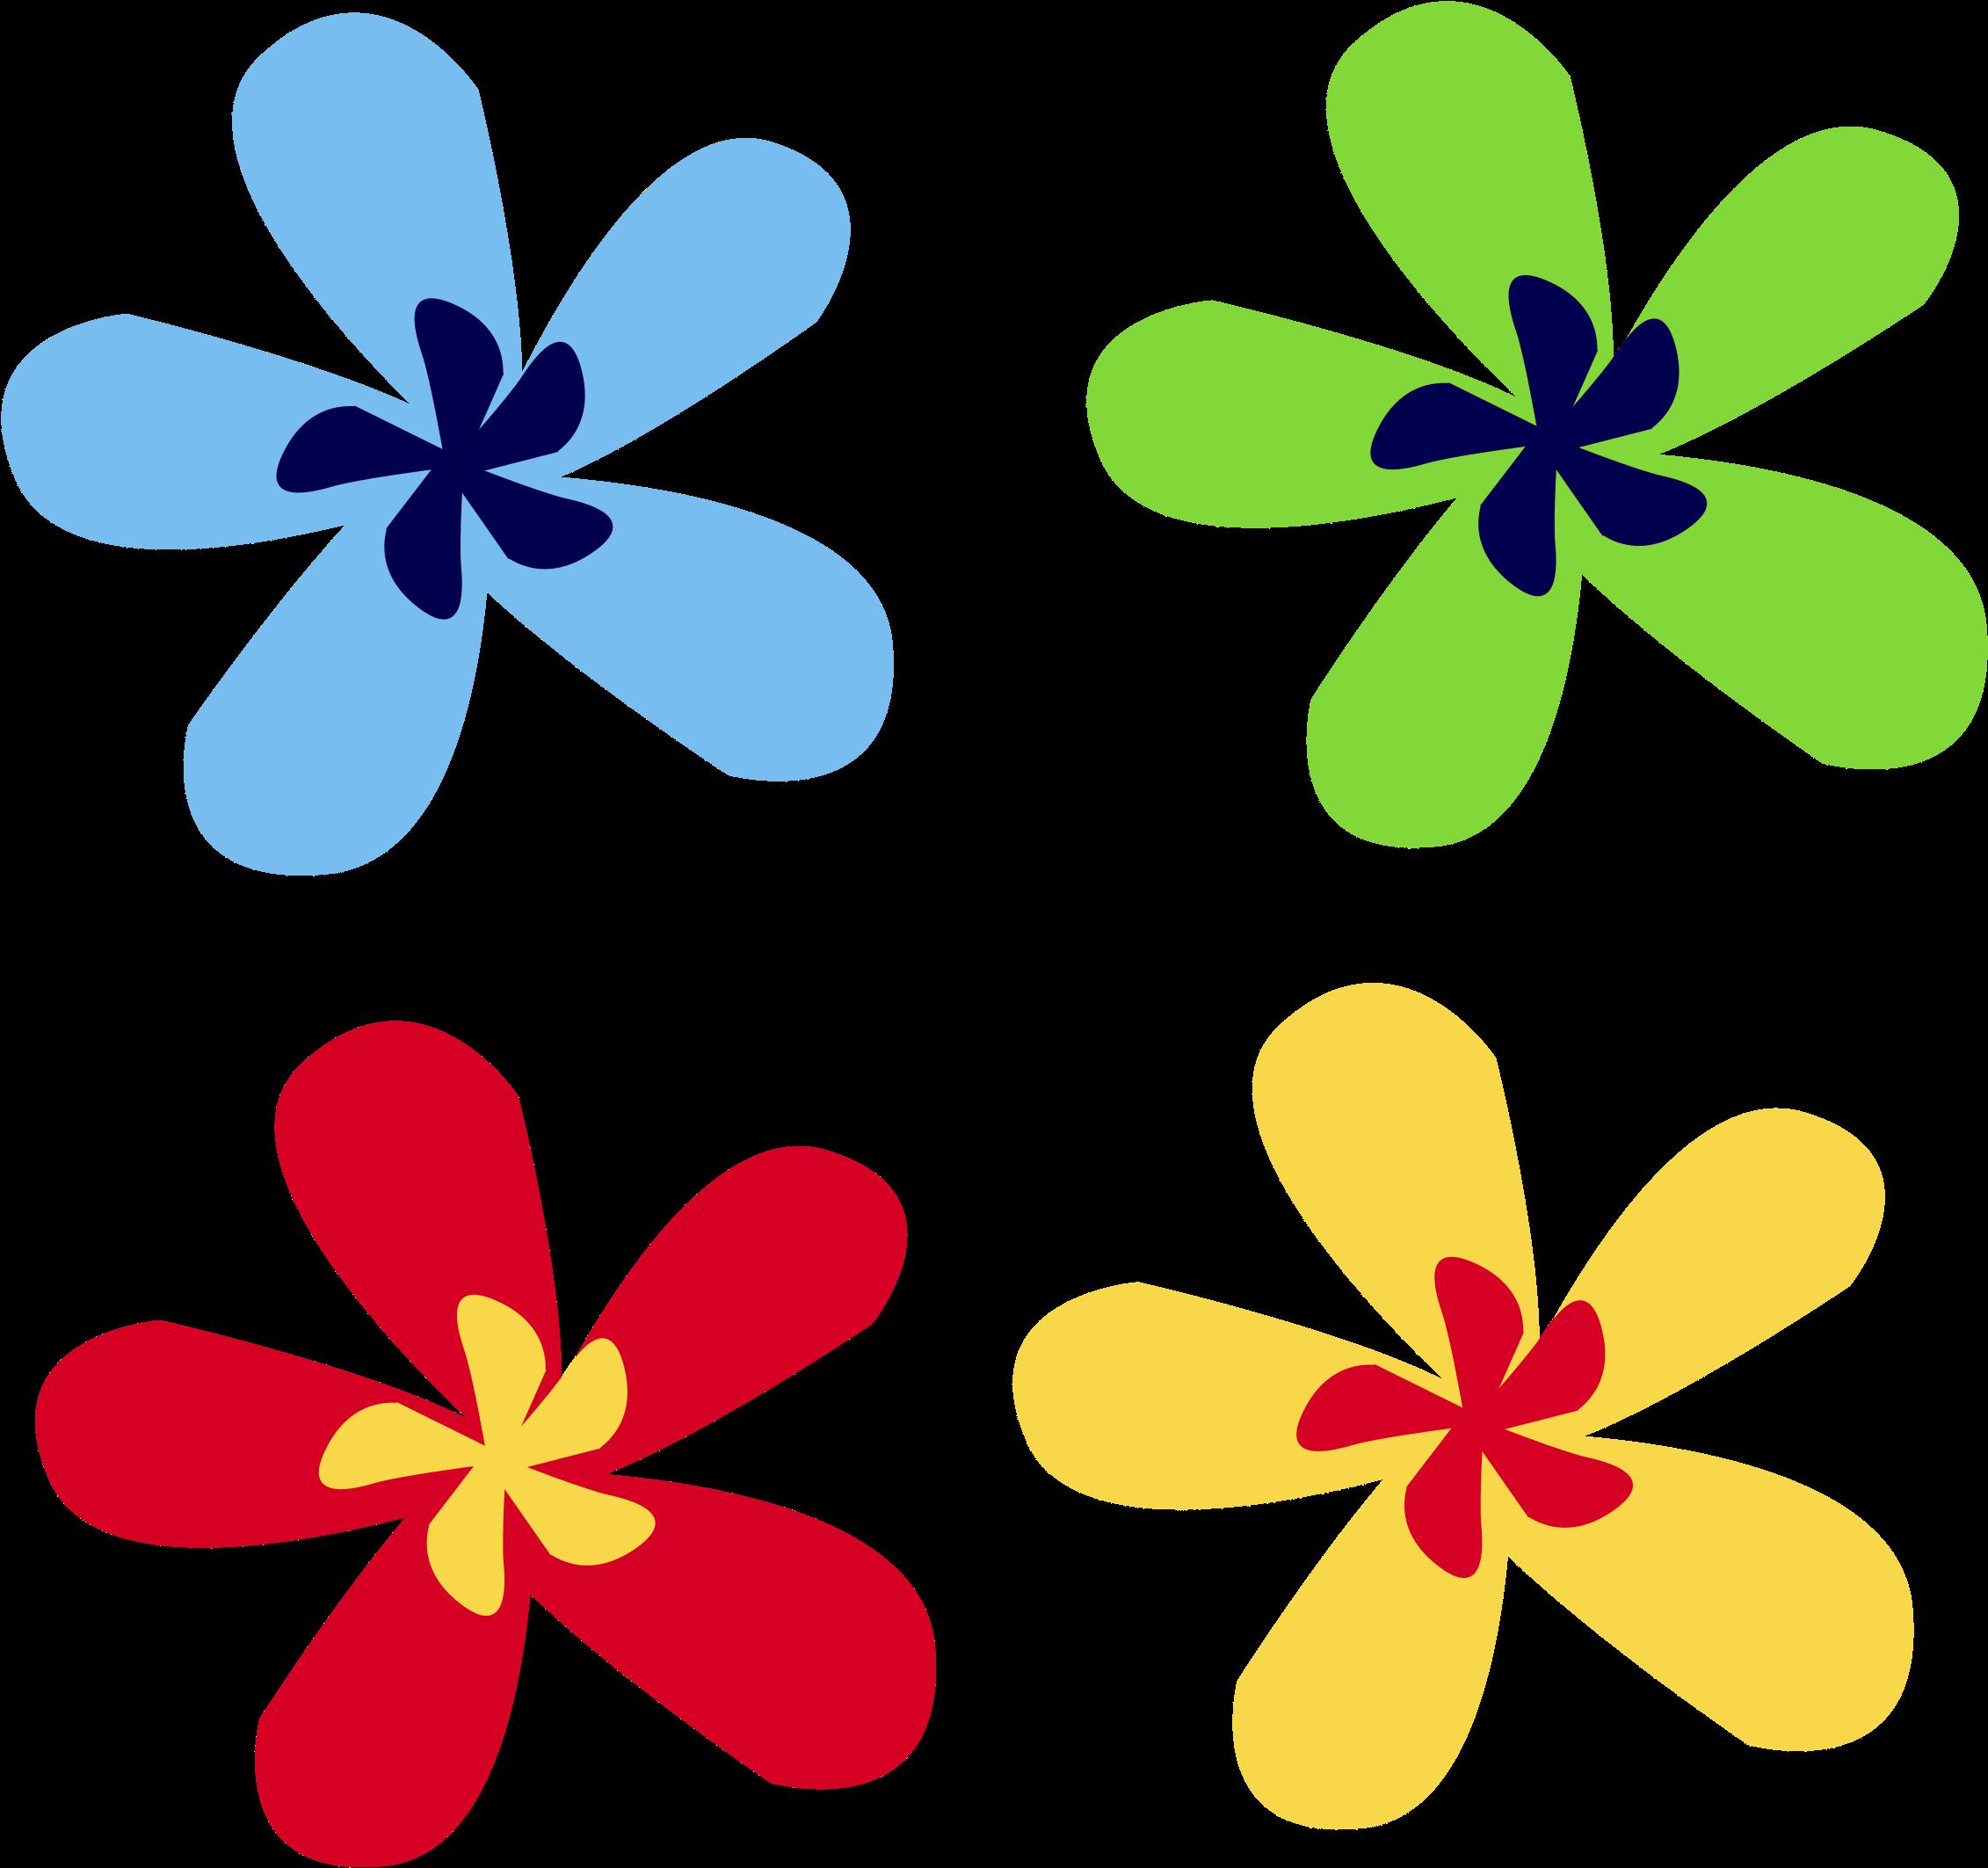 Flower Design Pictures.